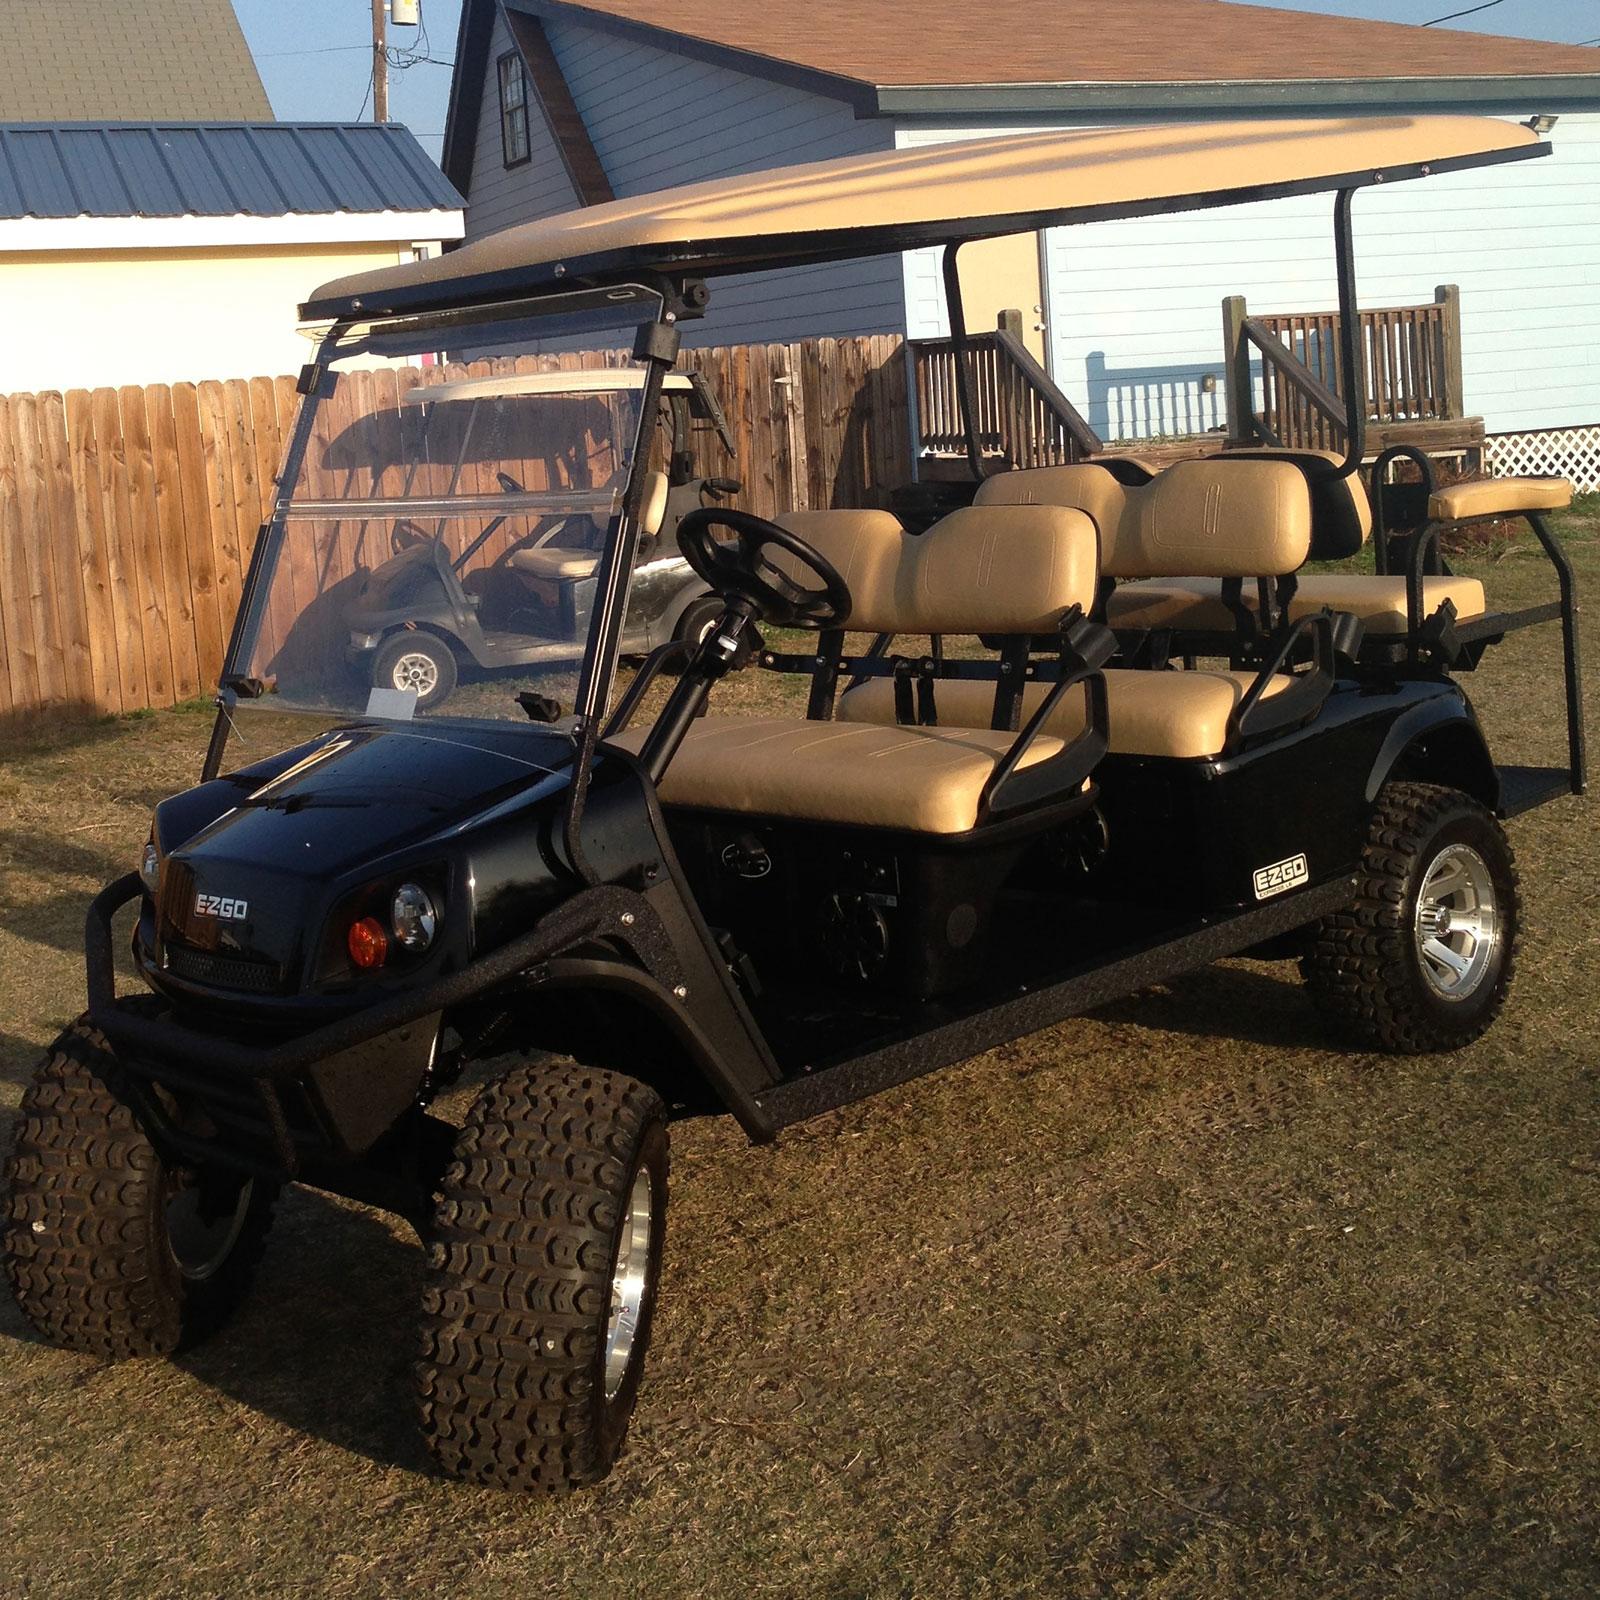 Black EZGO Golf Car